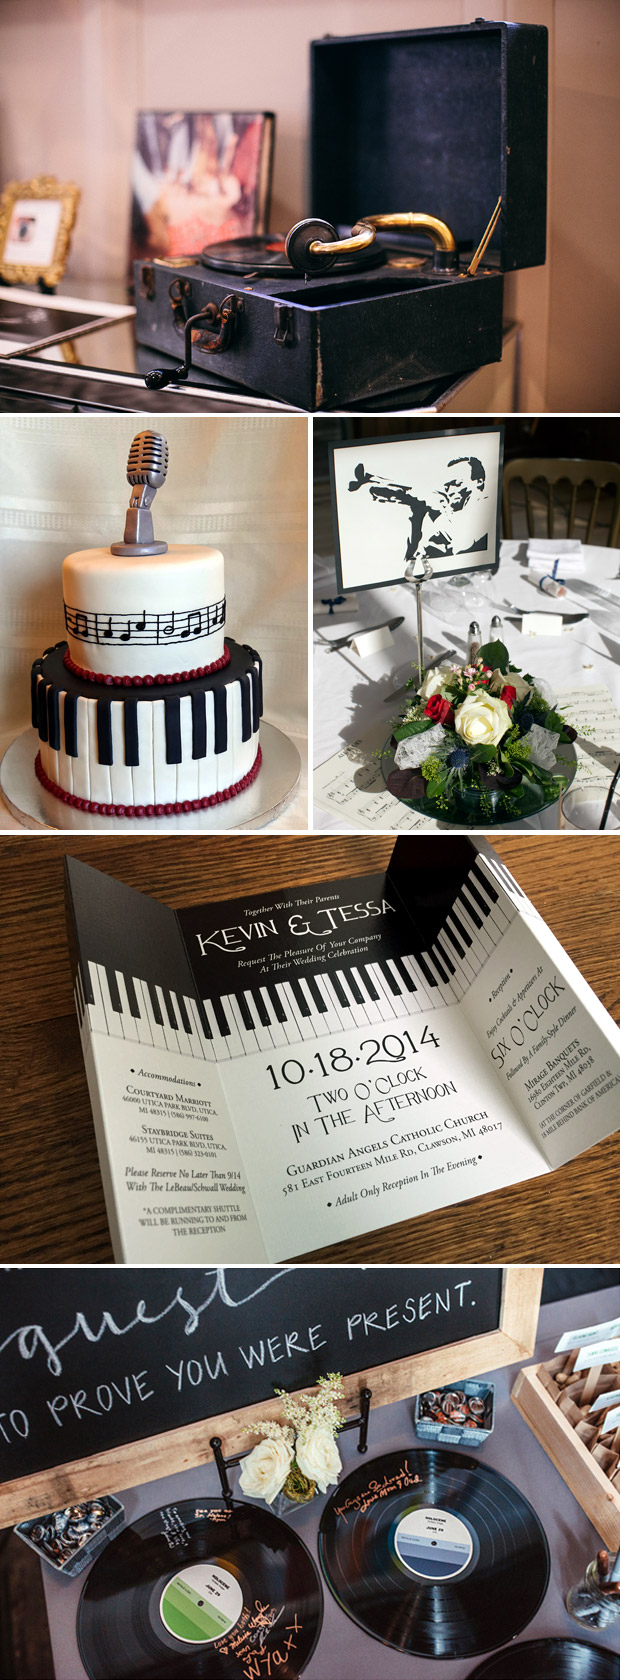 jazz-music-themed-weddings.jpg